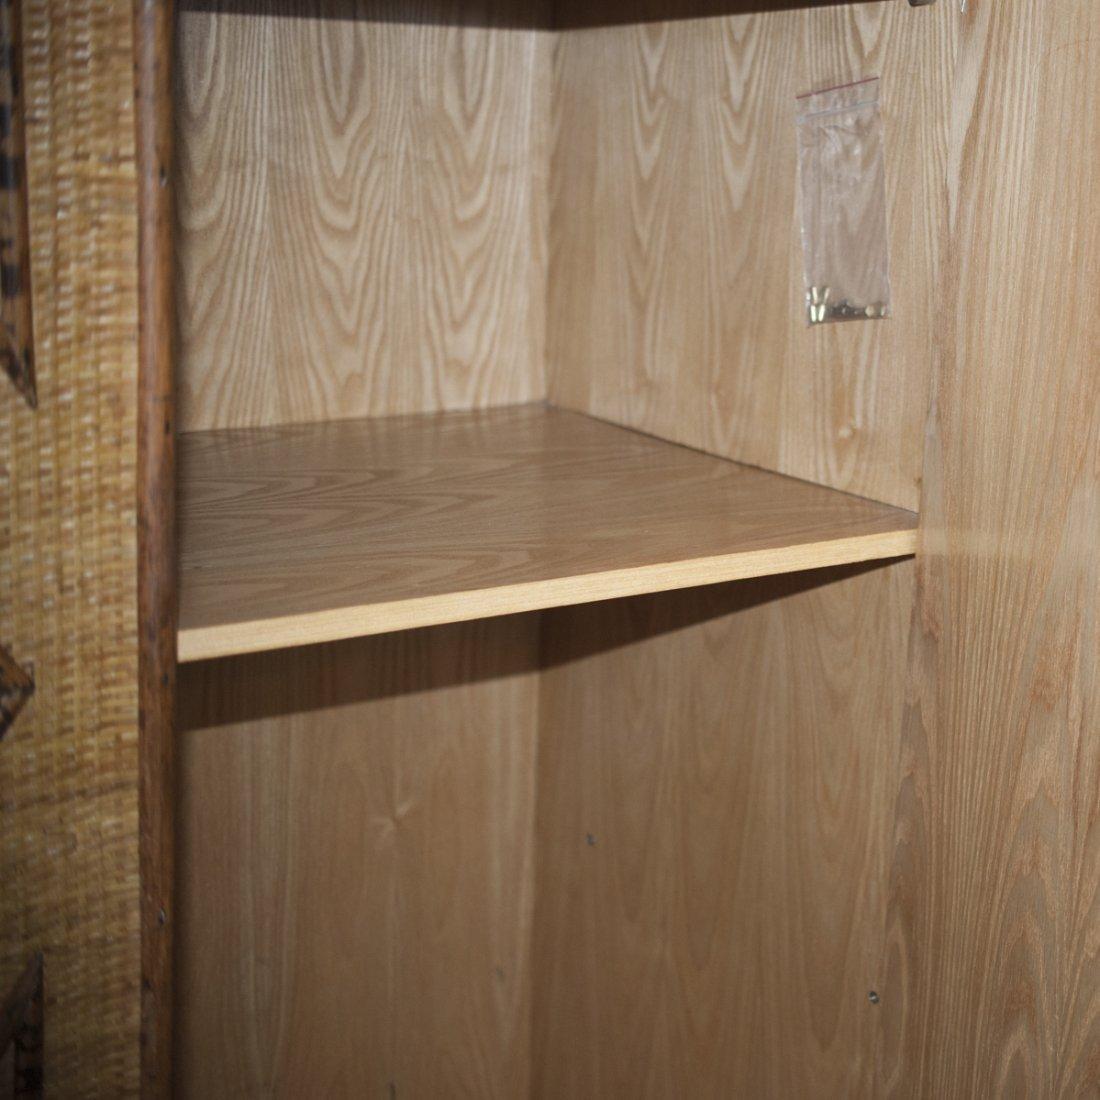 Vintage Wicker & Bamboo Furniture Set - 3